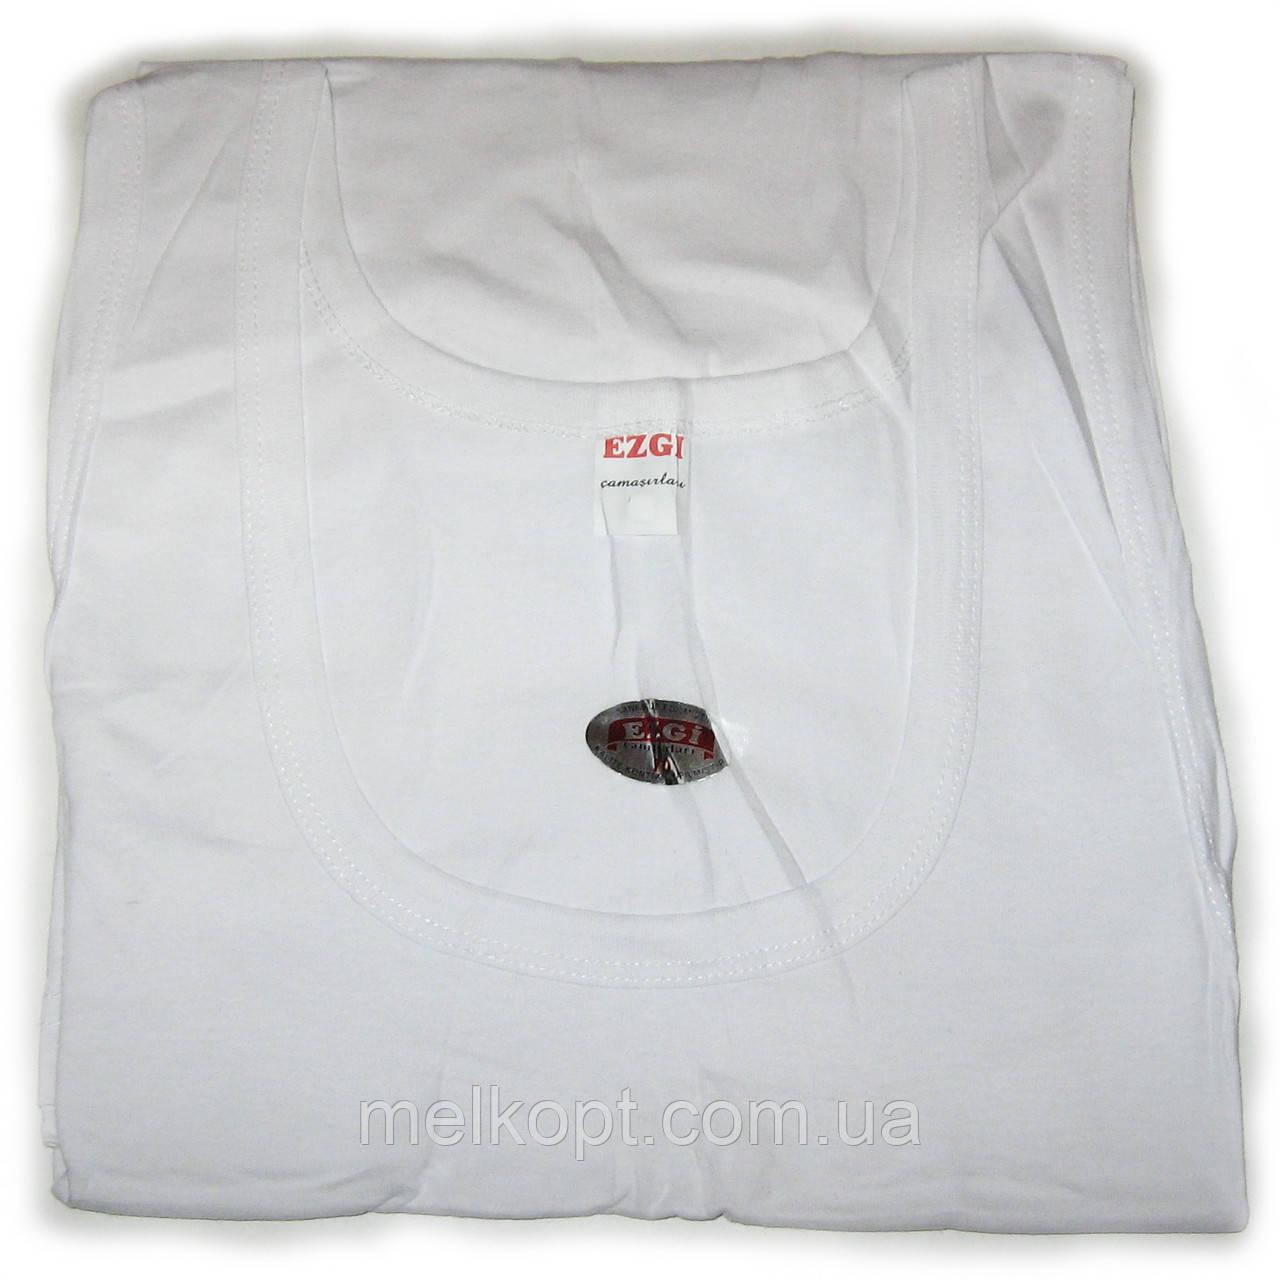 Мужские майки Ezgi - 51,00 грн./шт. (75-й размер, белые)